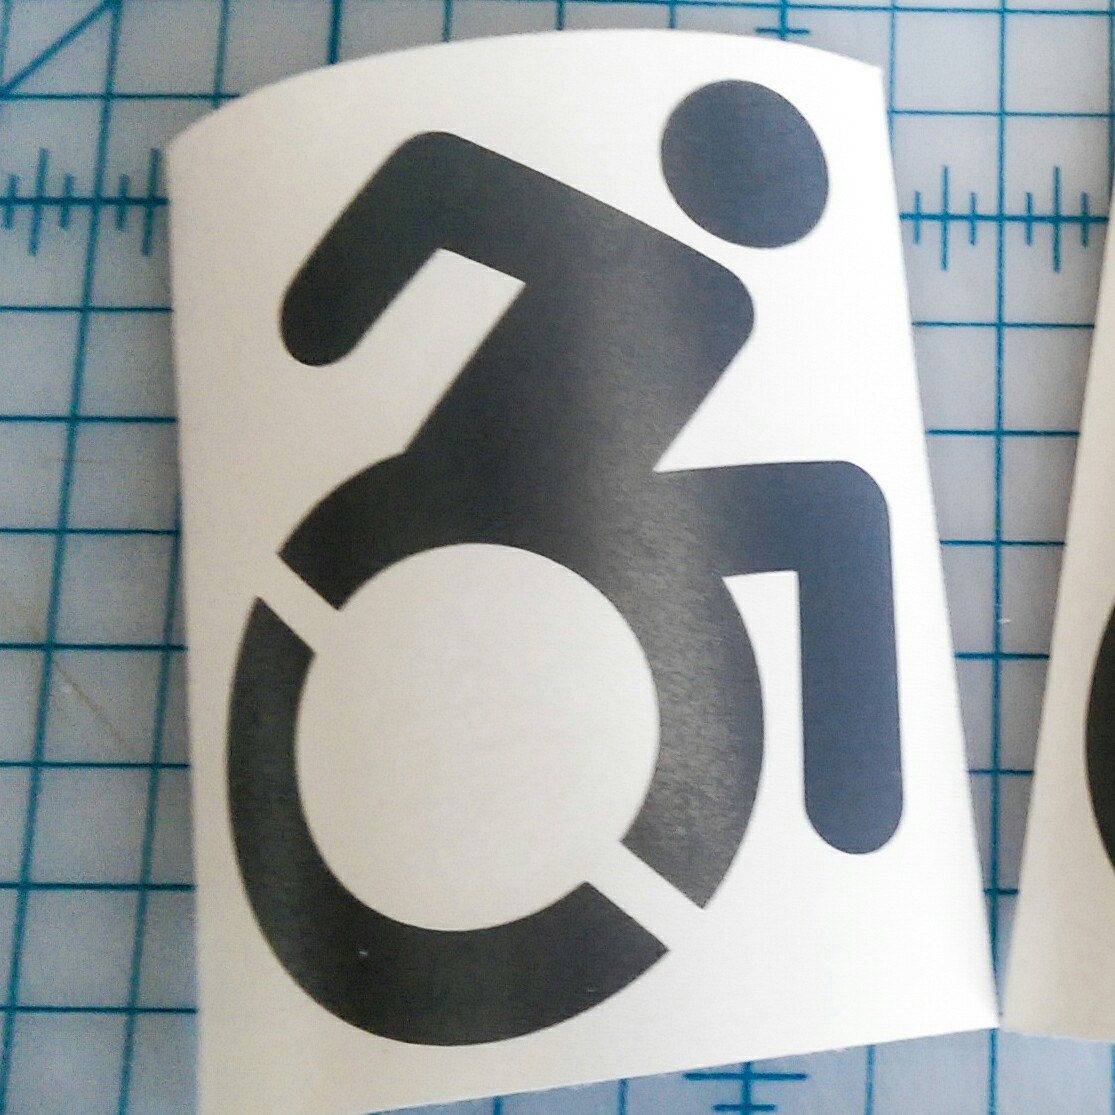 Modern Disabled Symbol Decal Wheelchair Access Sticker Ada Etsy Retro Reflective Handicap Accessories Laptop Decal [ 1115 x 1115 Pixel ]